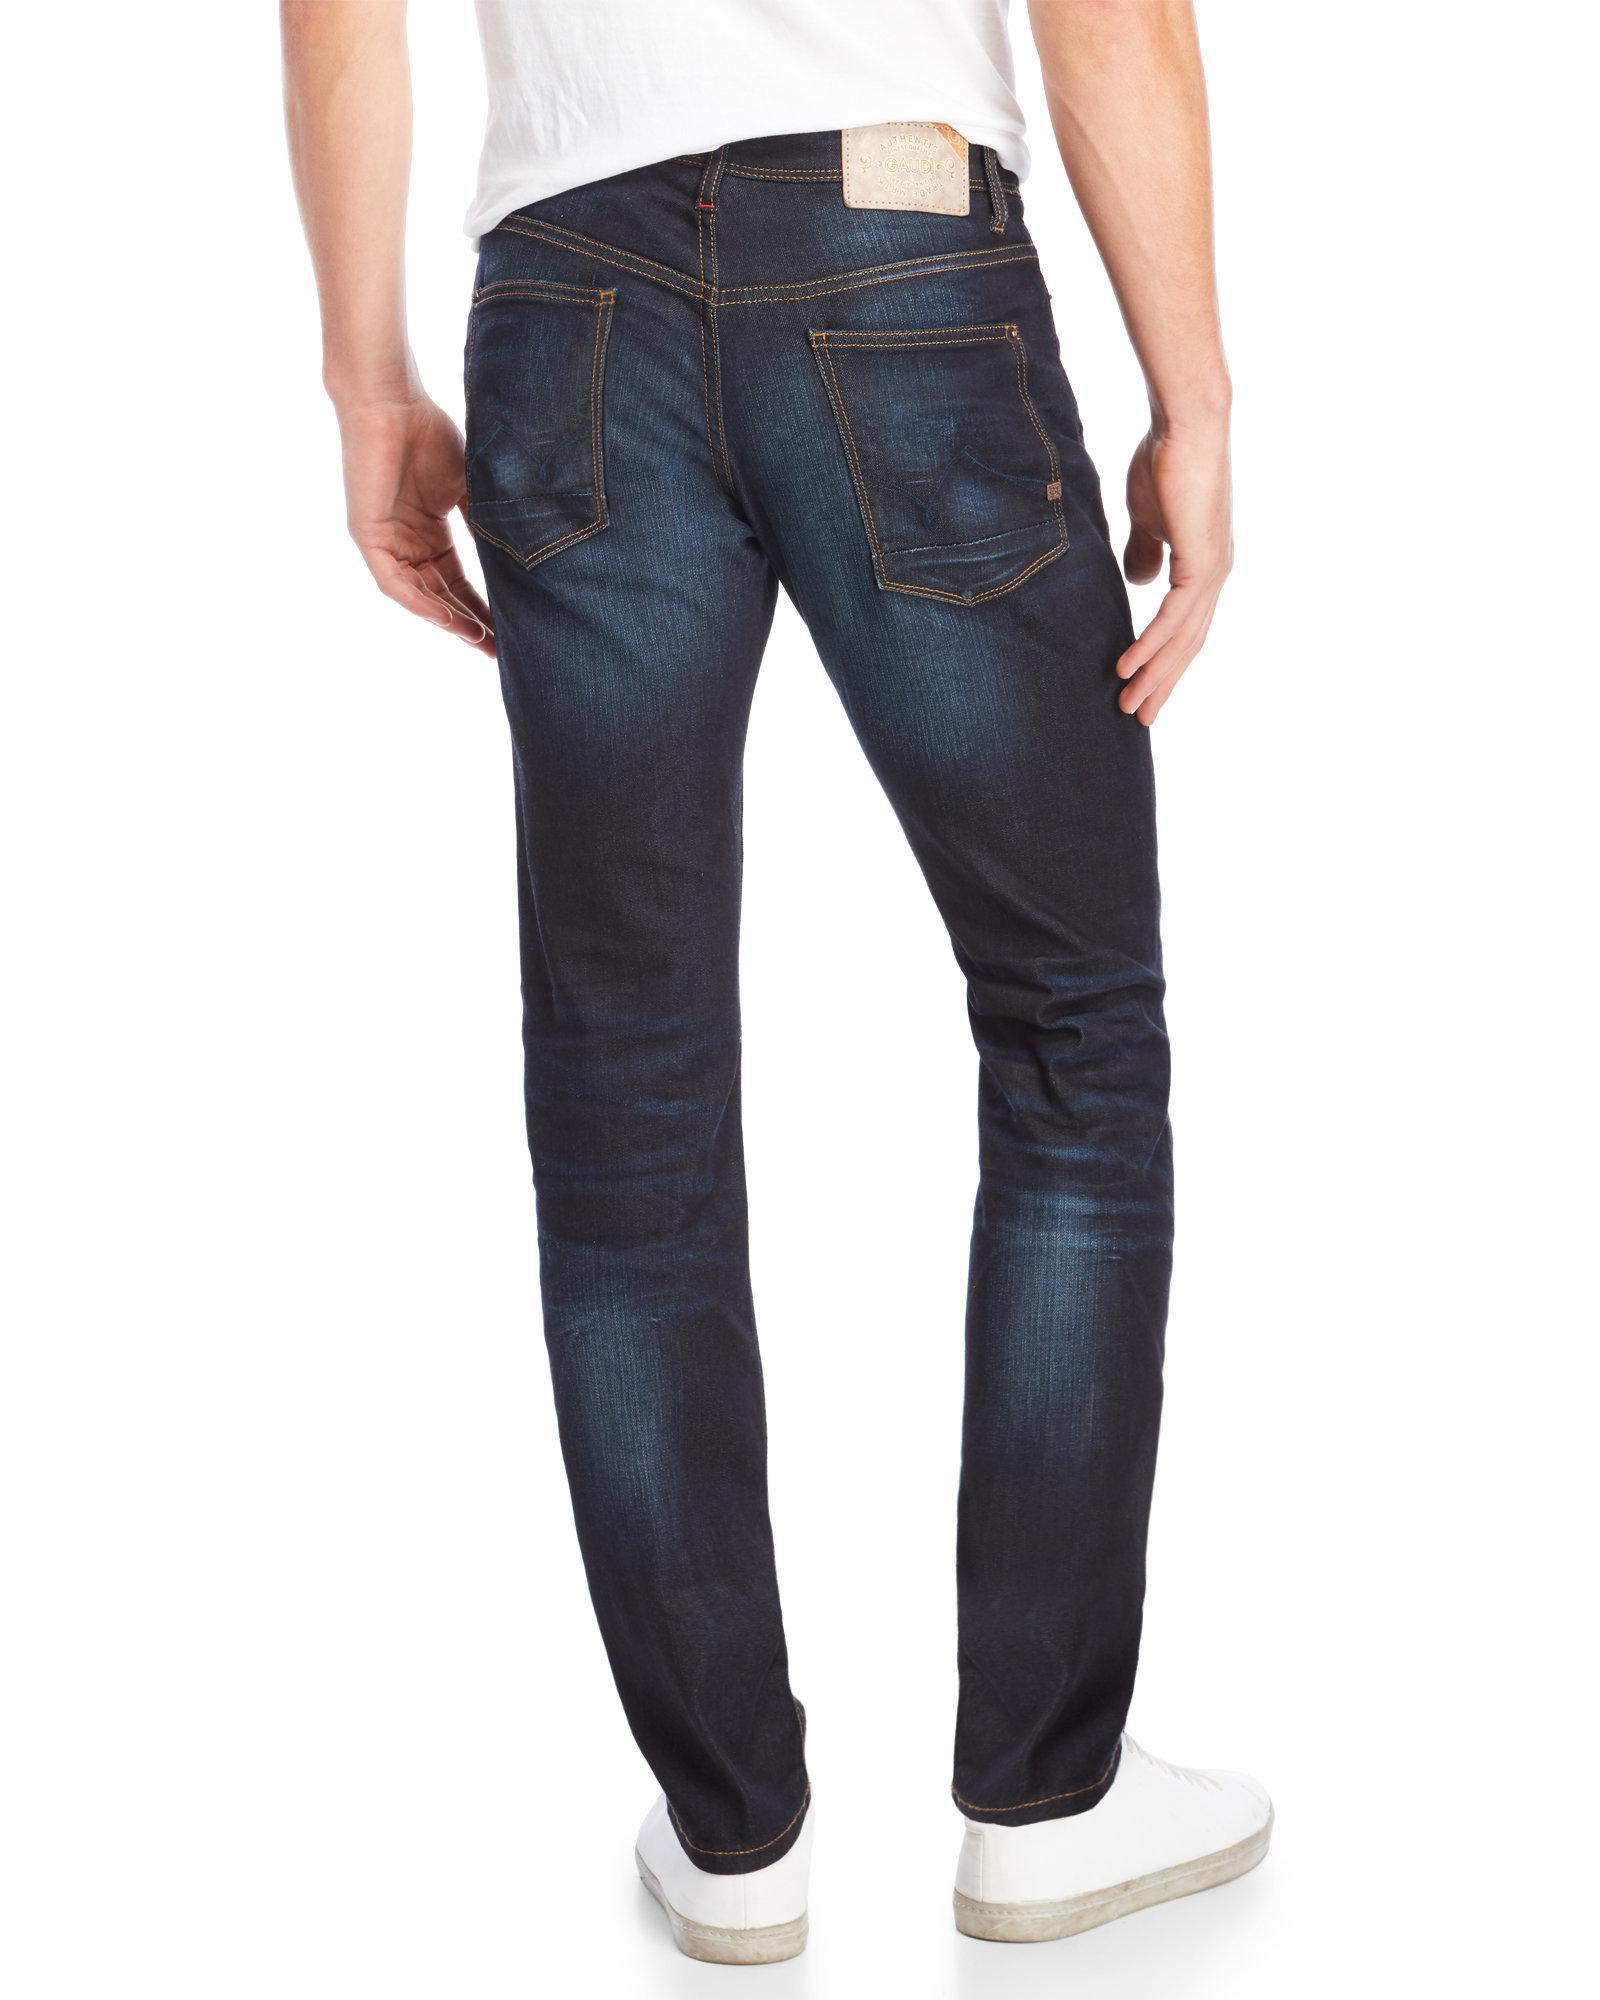 Mens Slim Jeans Gaud? hUUtIHv